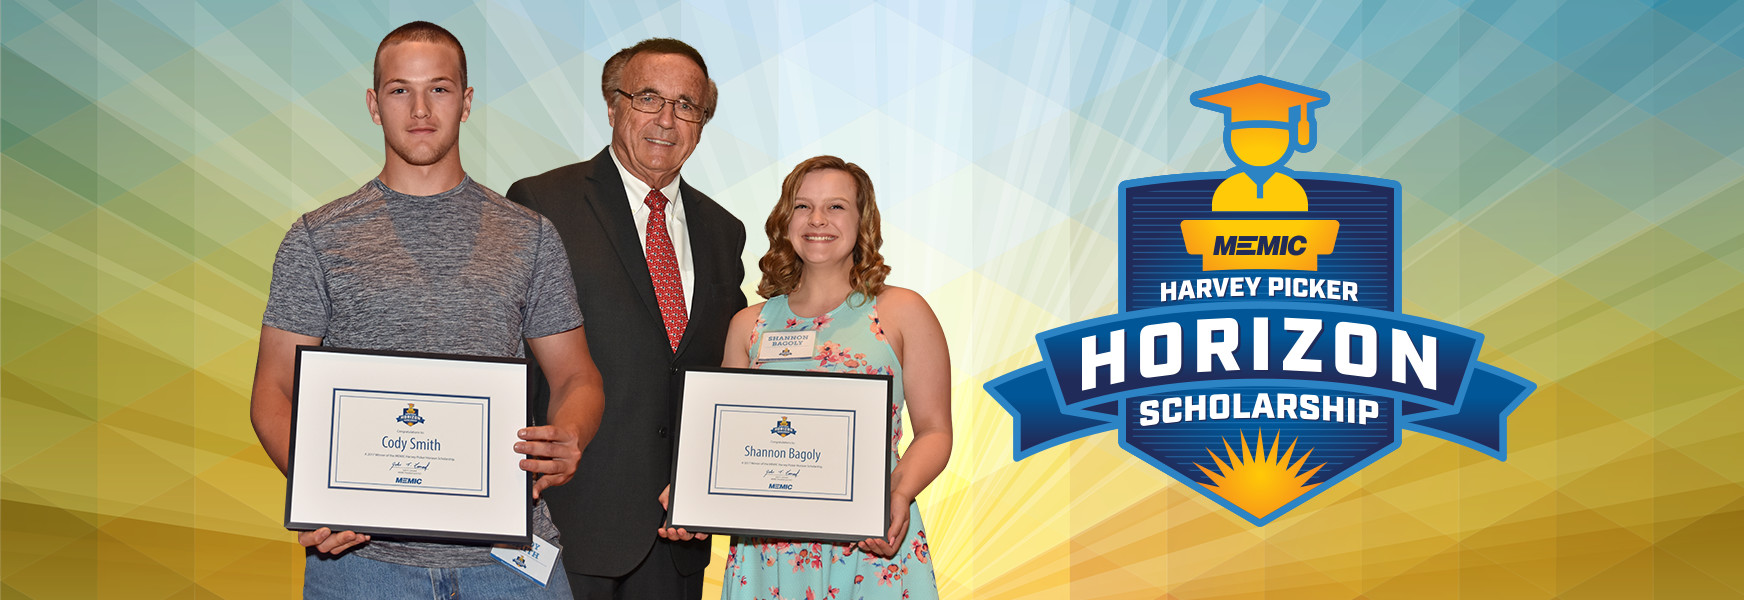 2017 MEMIC Harvey Picker Scholarship award recipients